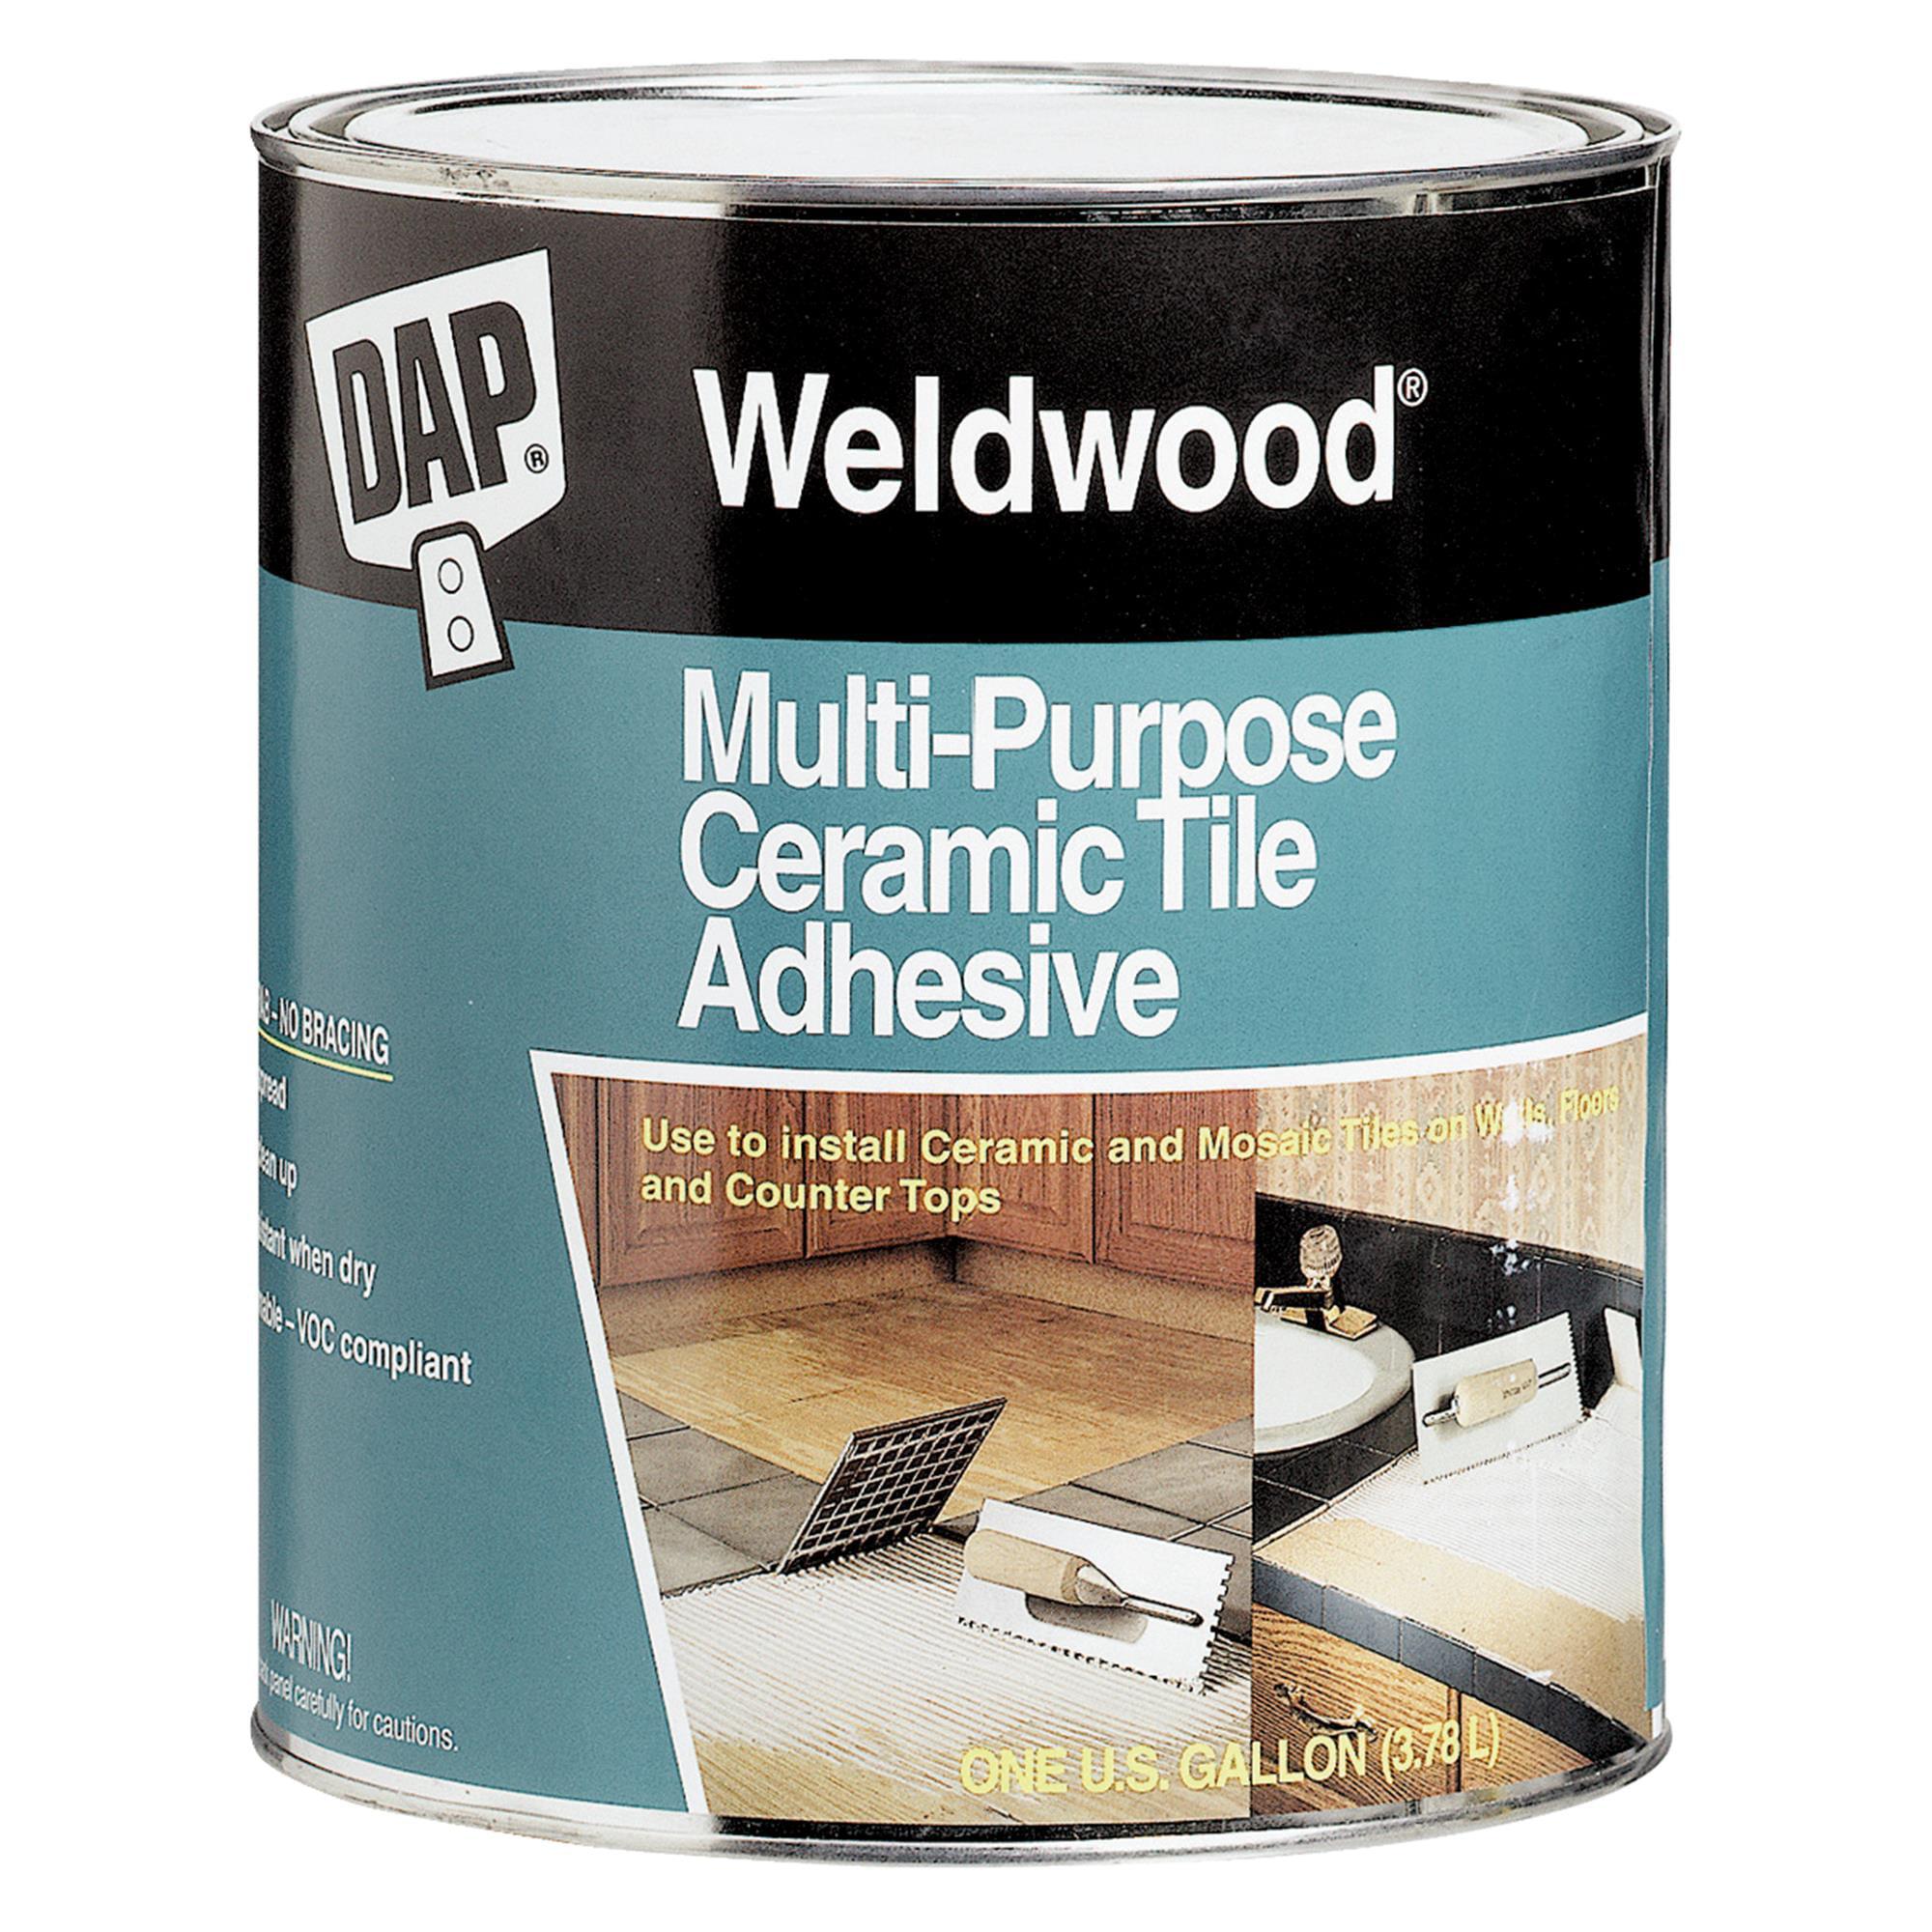 Ceramic tile adhesive dap 25192 1 gallon weldwood multipurpose ceramic tile adhesive dailygadgetfo Gallery